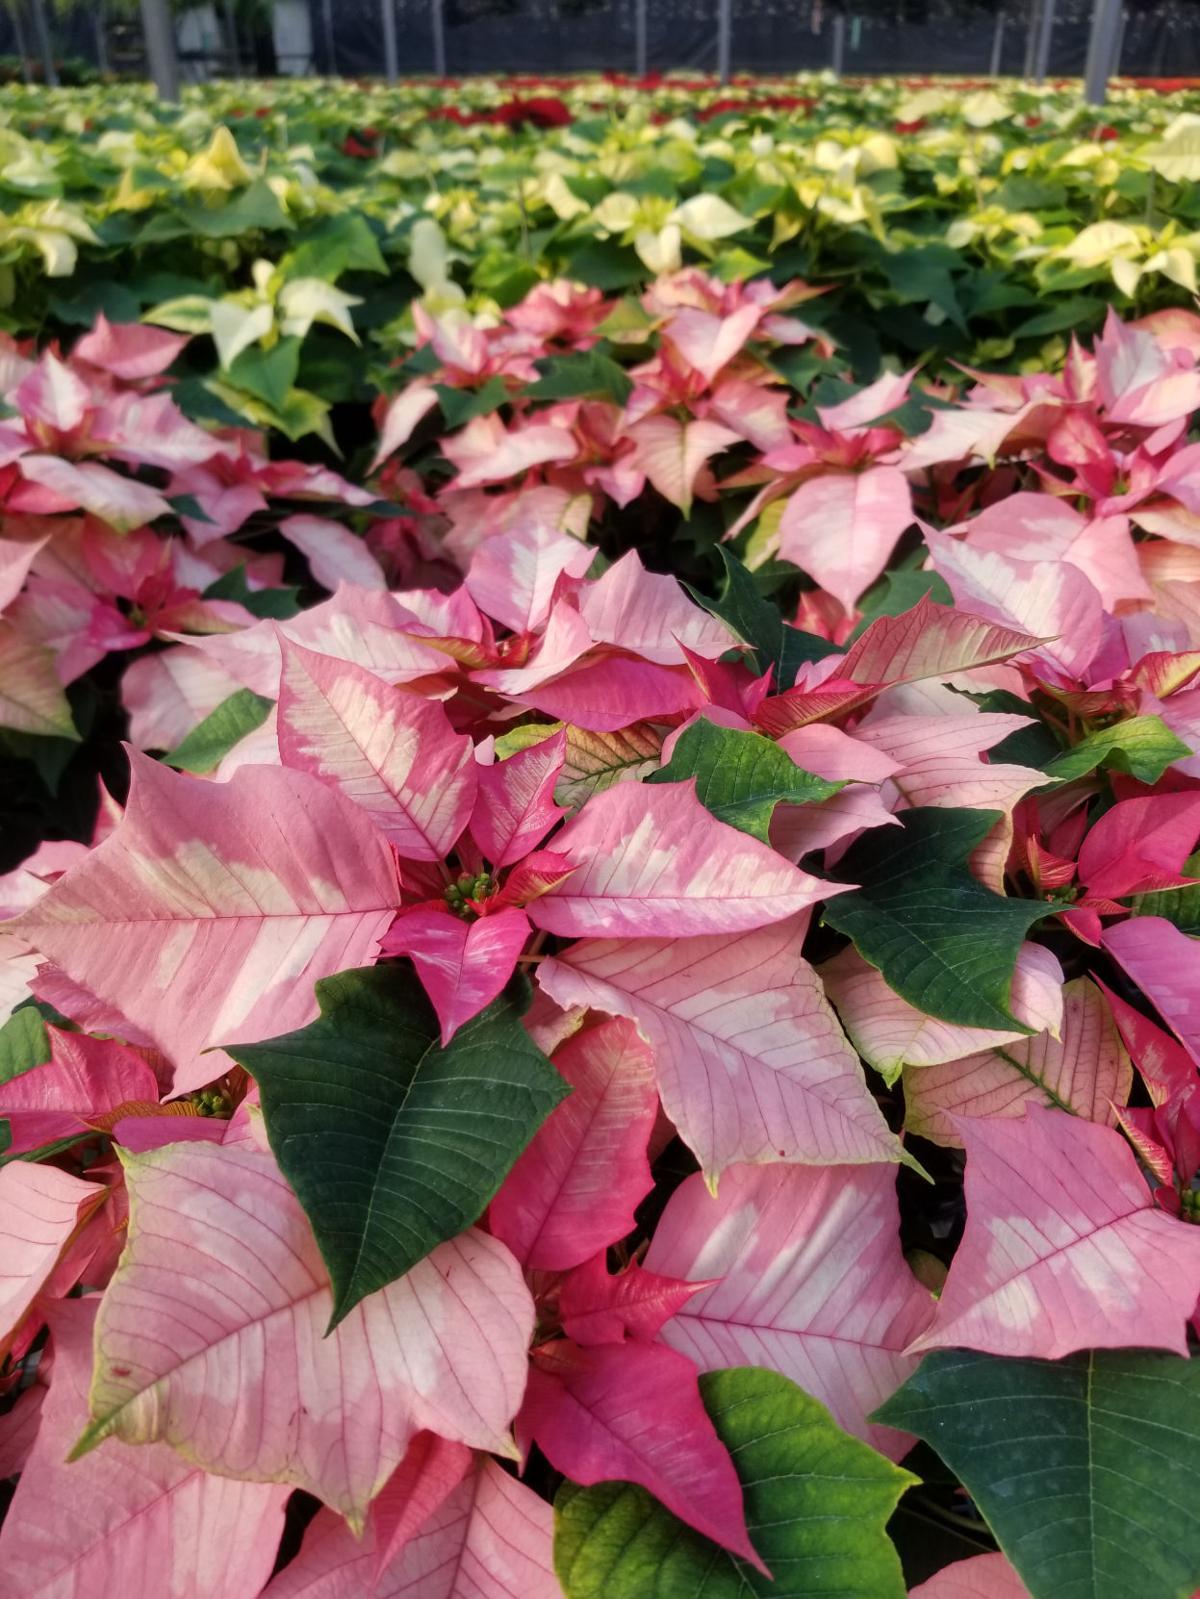 Poinsettias Travel Far To Bring Holiday Cheer Richmond Com